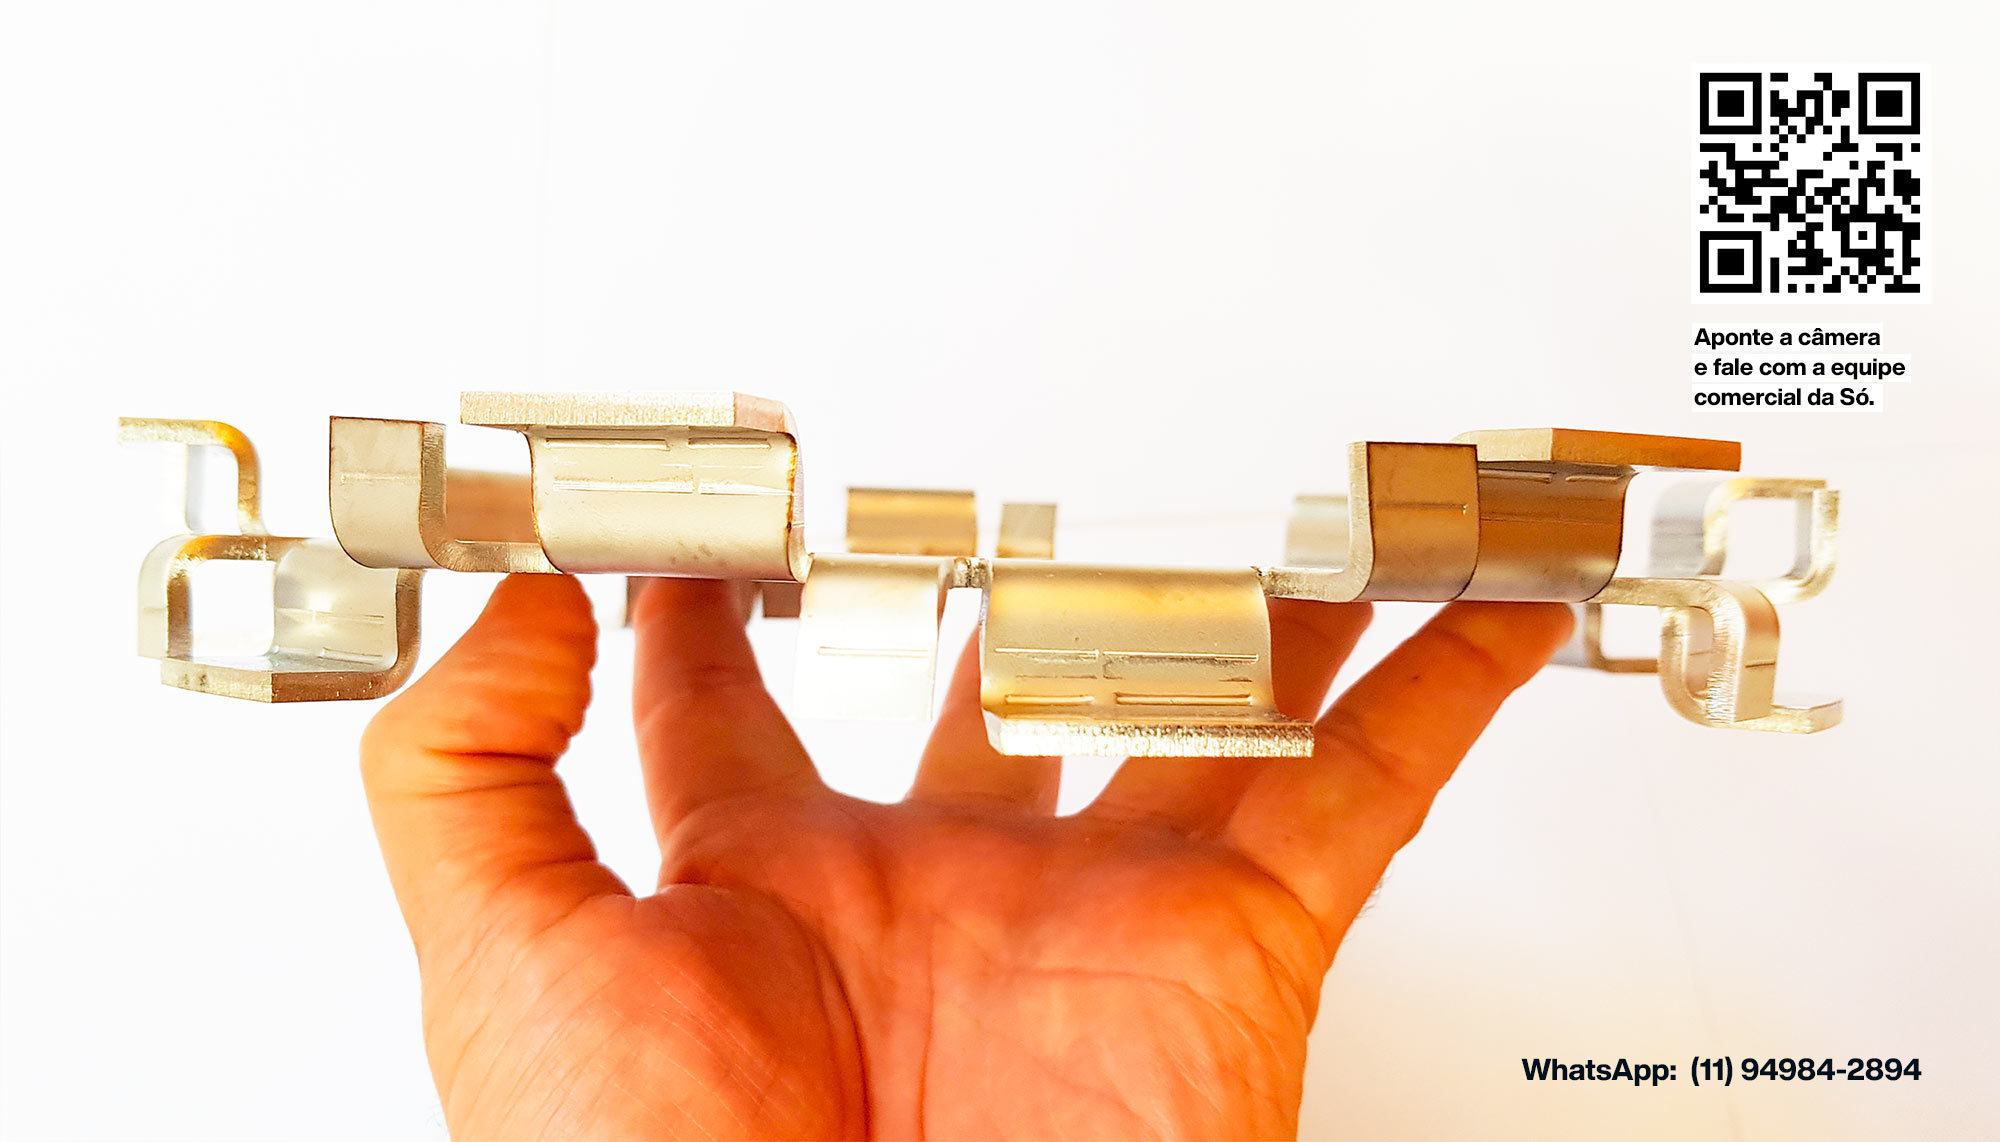 Hélice Italiana Alpini em aço inox para cosméticos